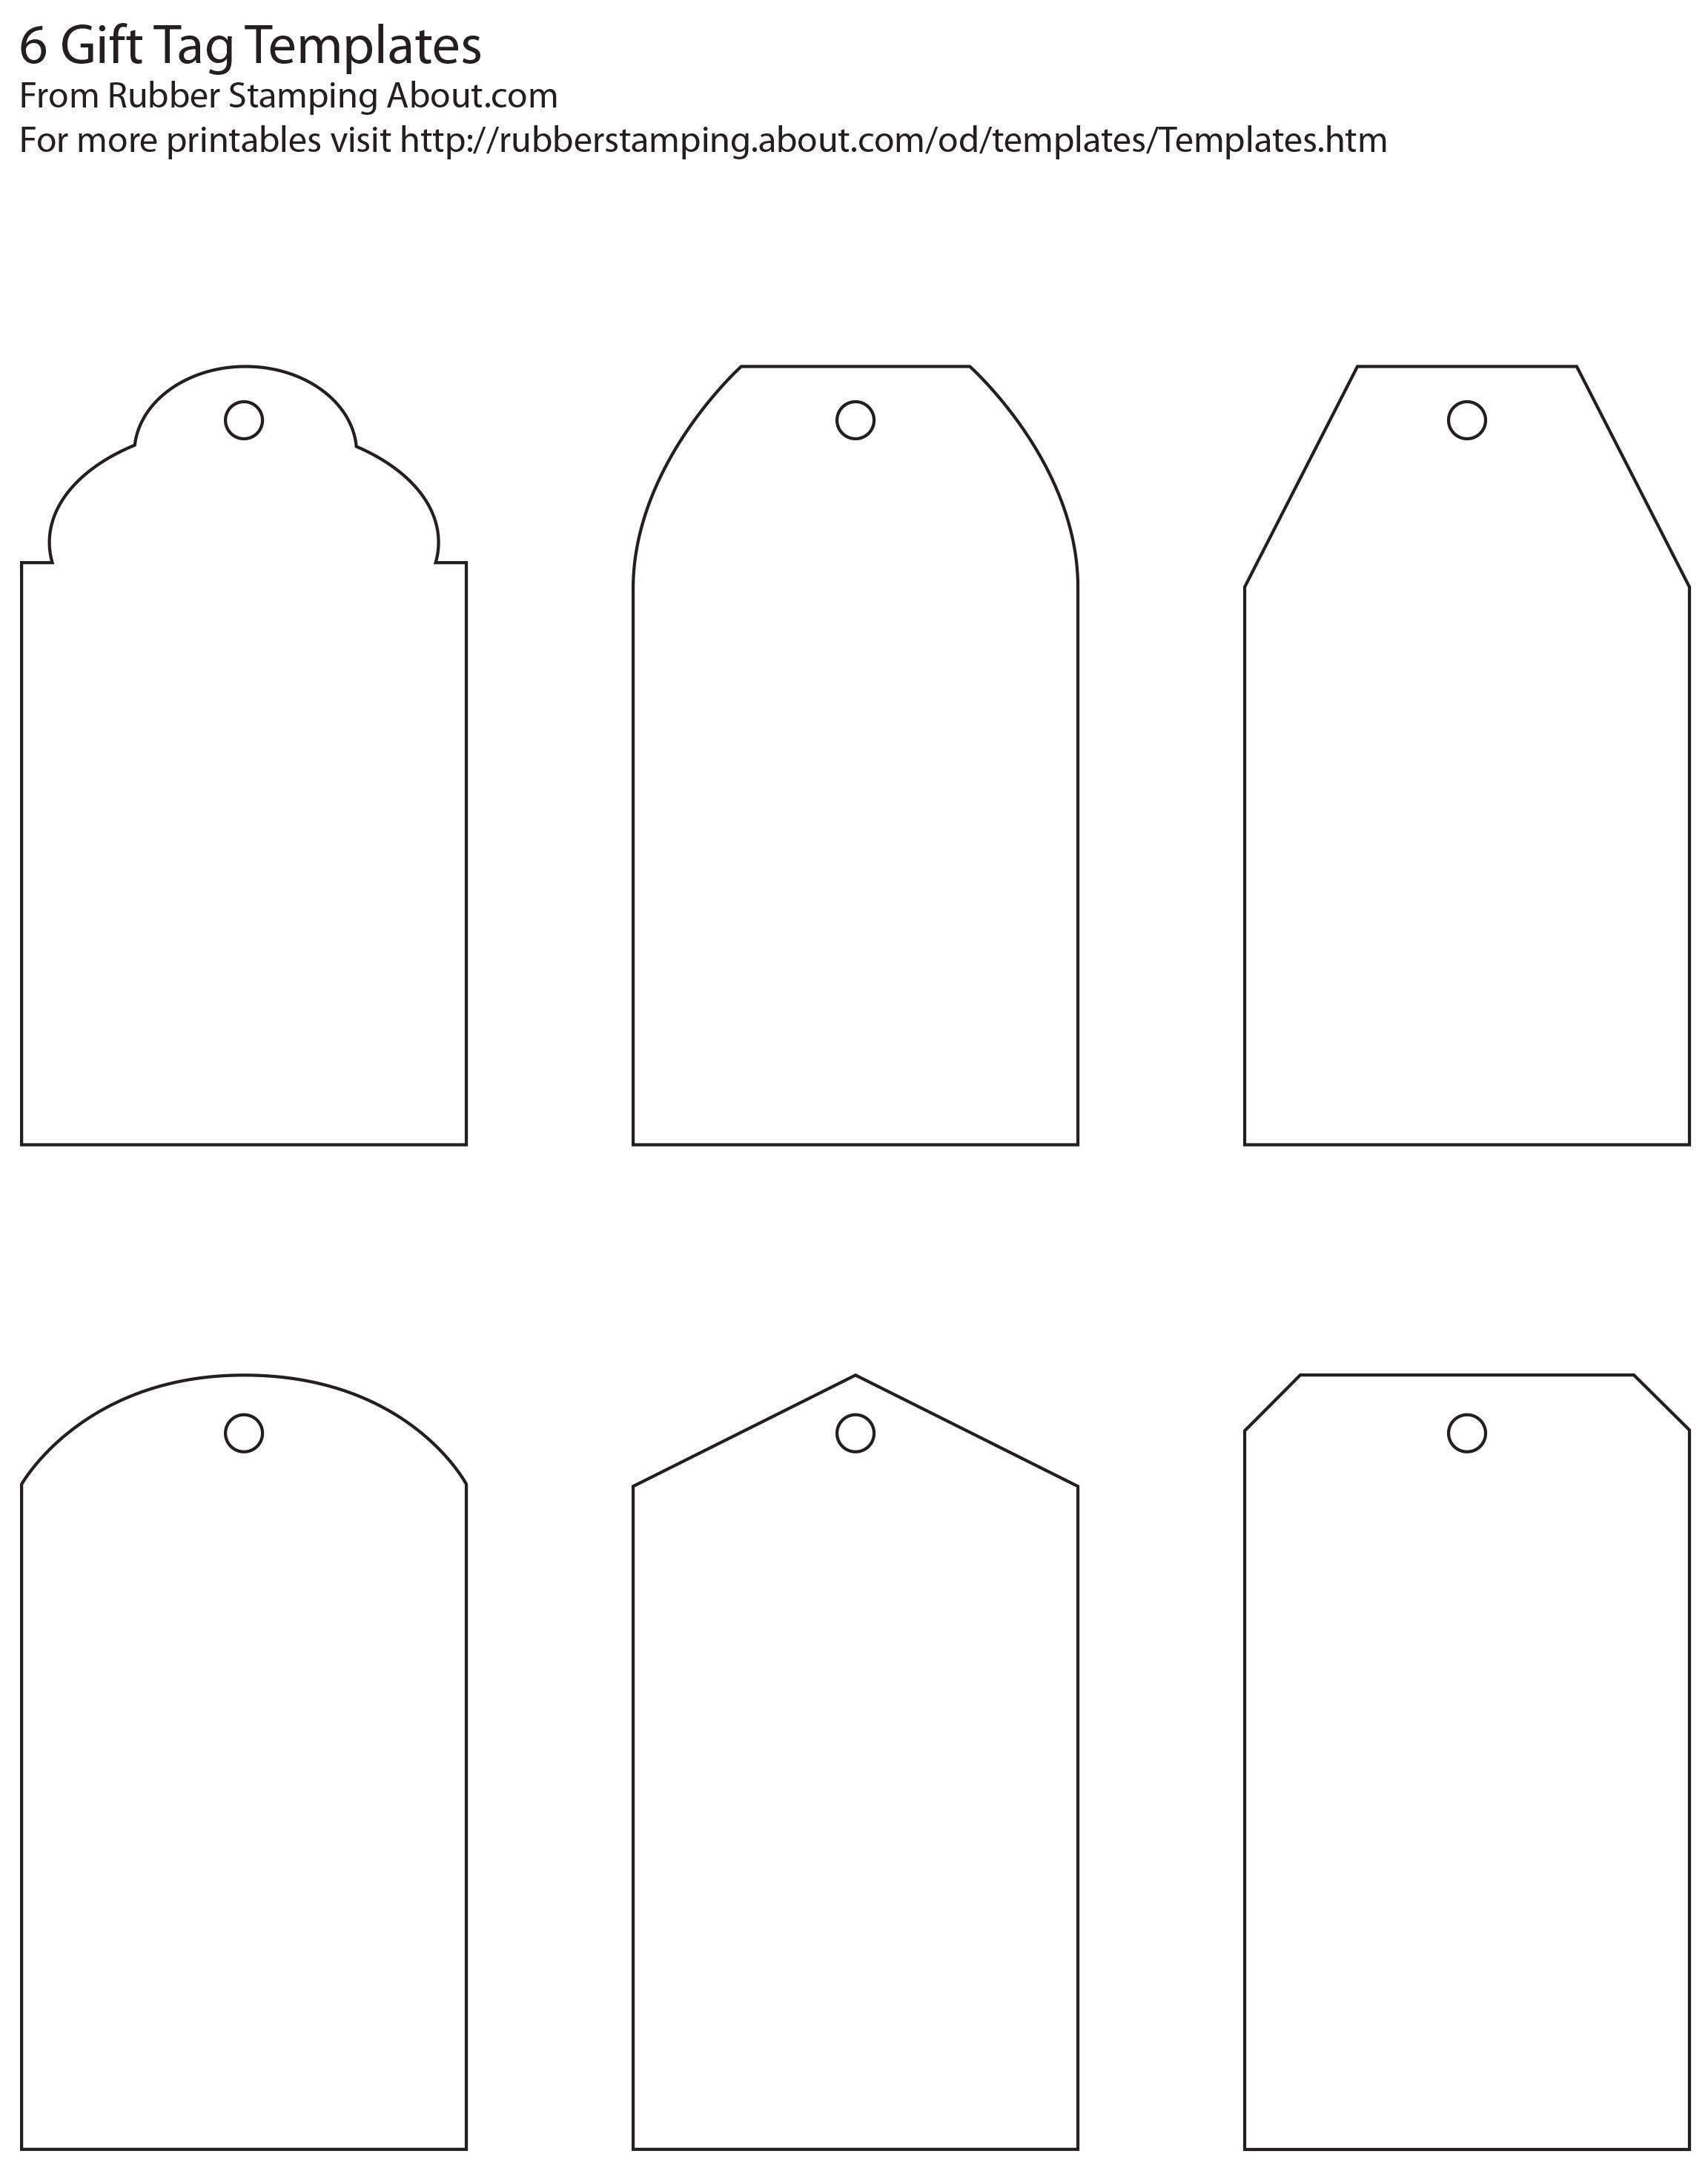 Free And Whimsical Printable Gift Tag Templates | Great Idea - Diy Gift Tags Free Printable